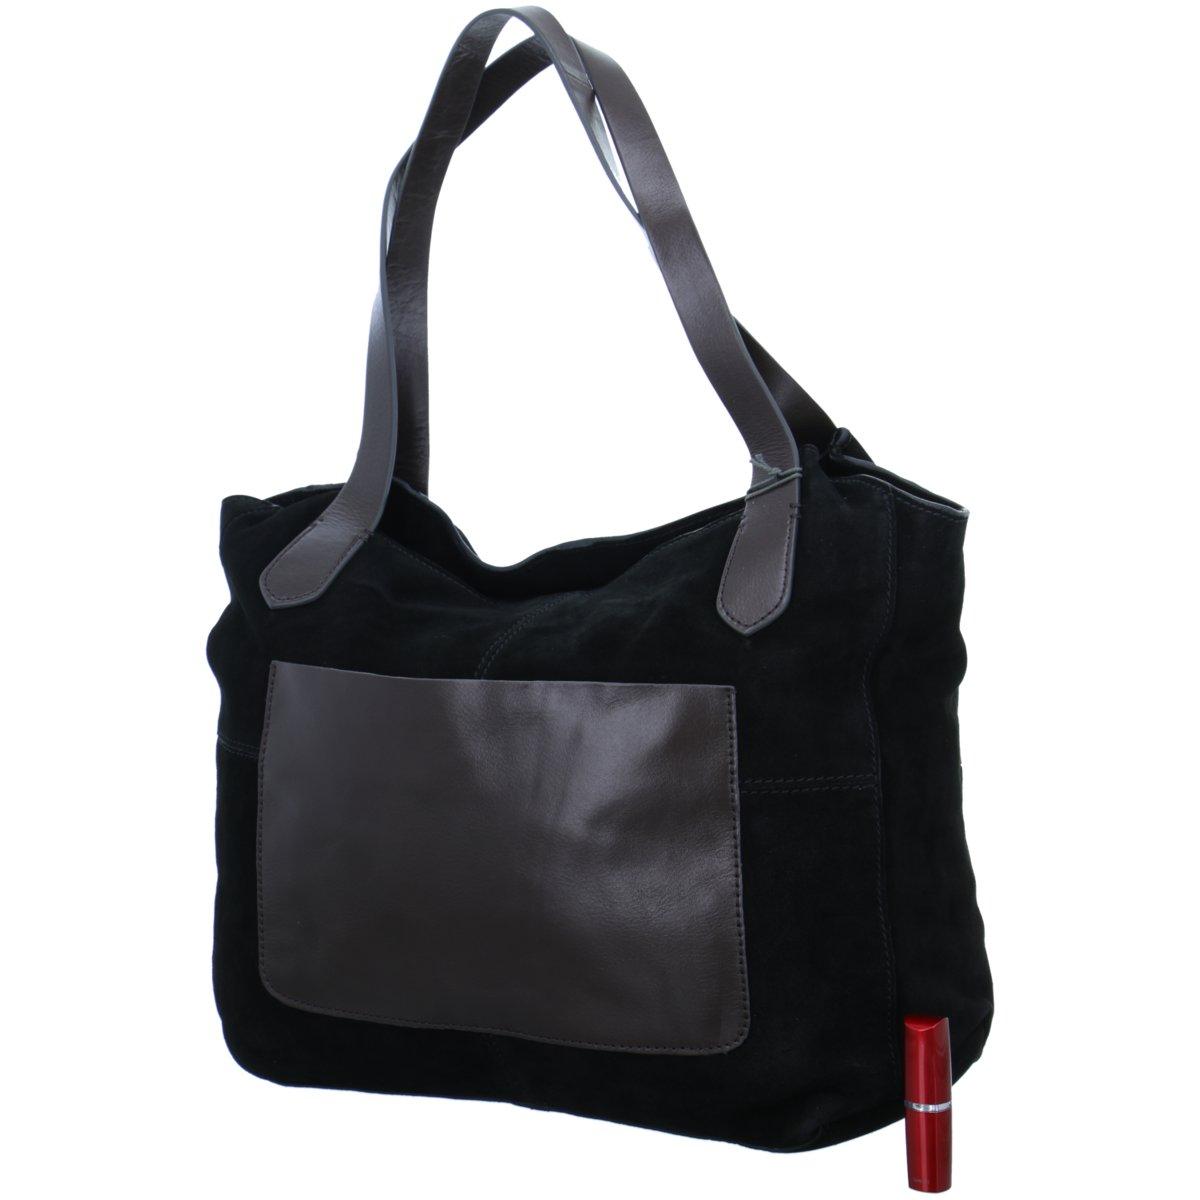 Clarks Accessoires Taschen Tacita Tacita Tacita Mix Damen Shopper 261300720 schwarz 356451   | Online Shop Europe  | Online-Shop  | Großartig  00bbdd